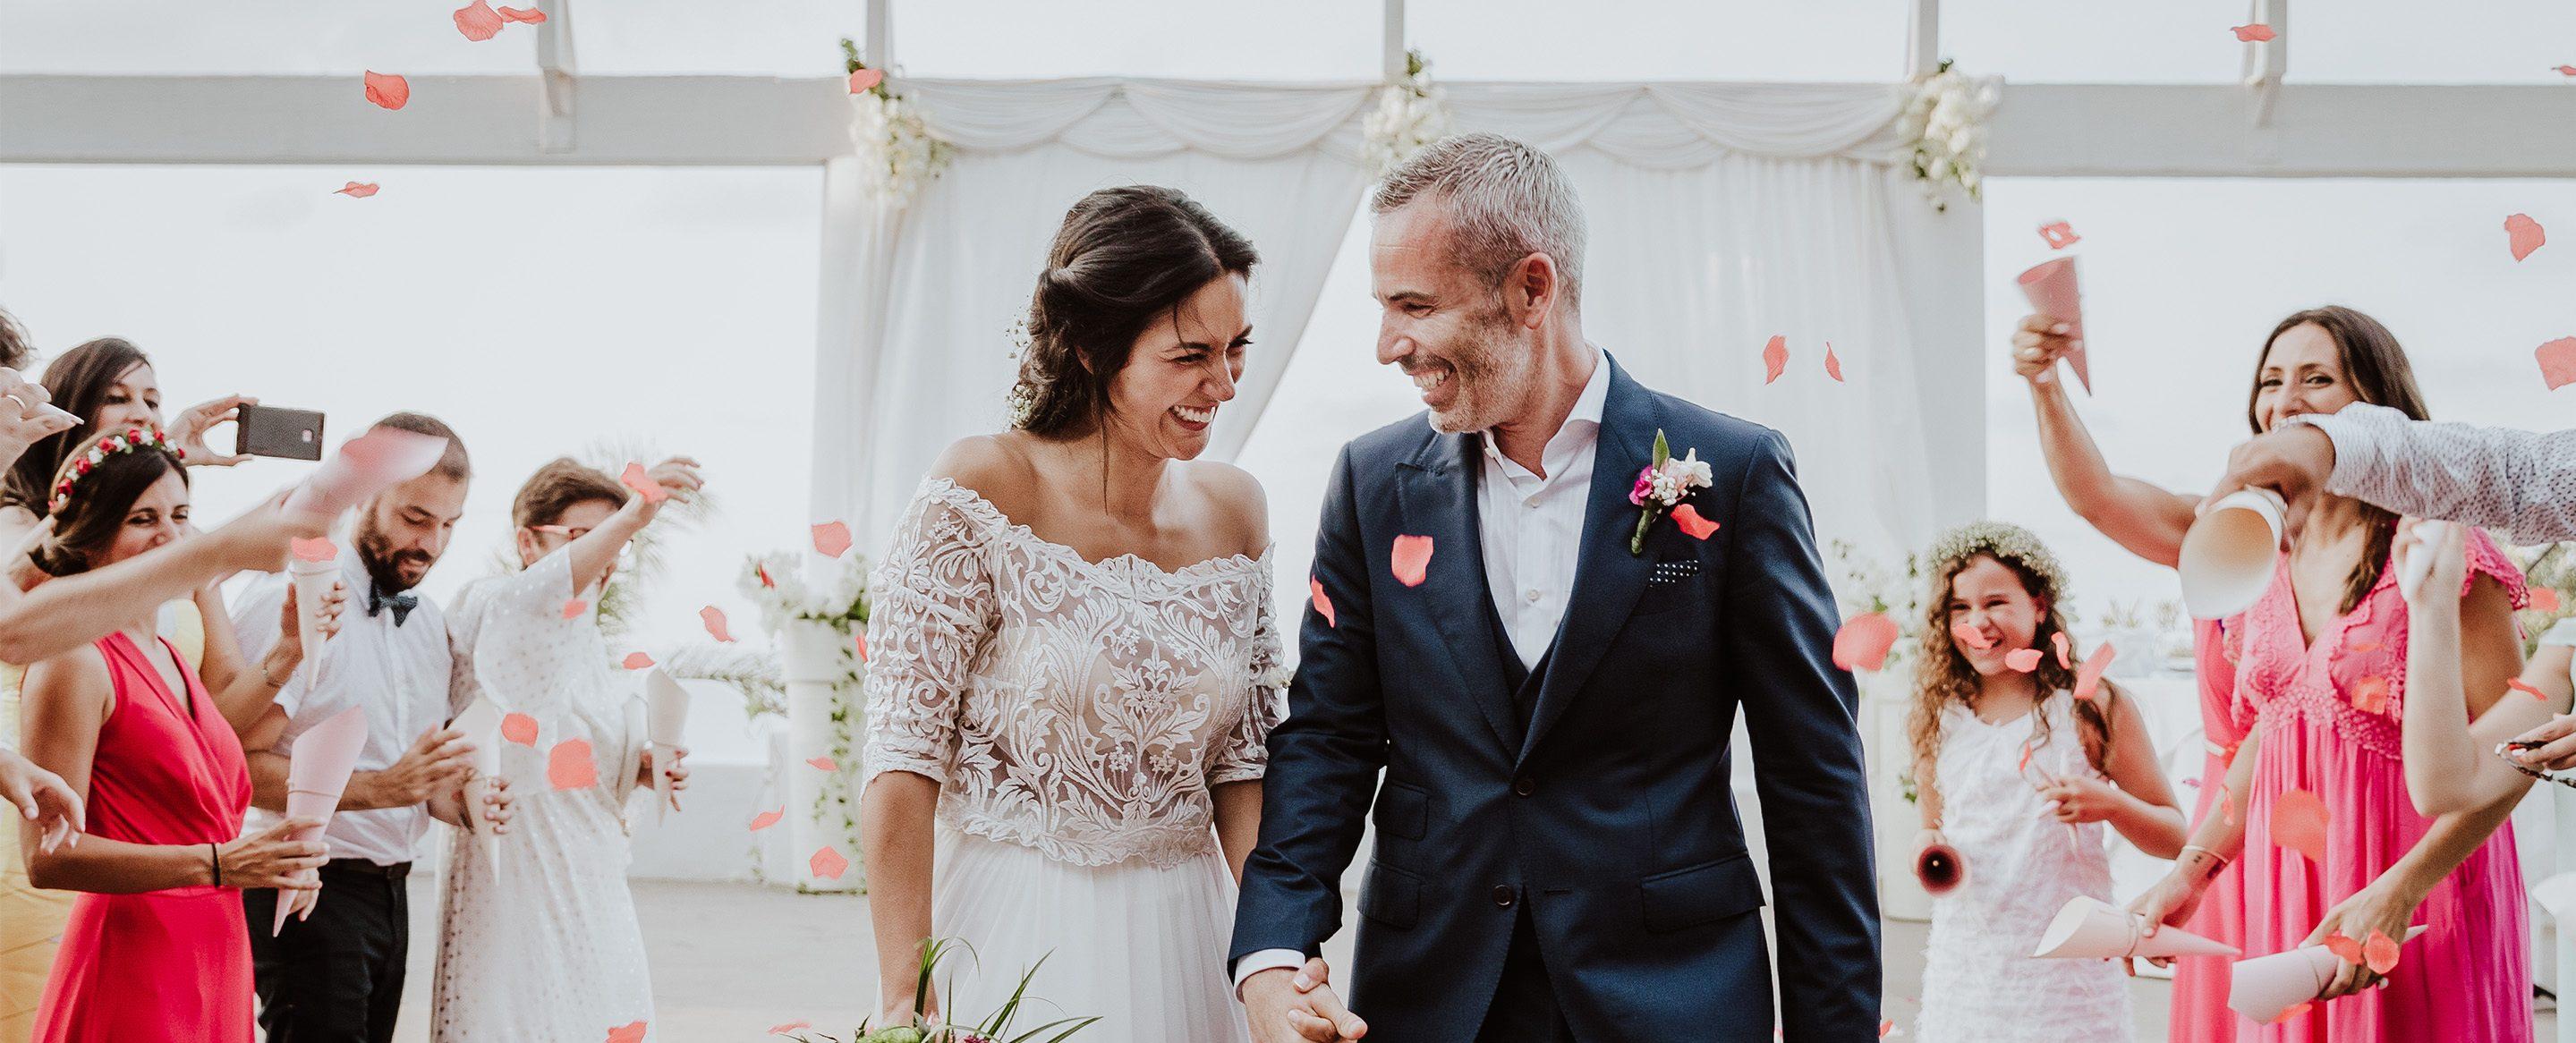 Wedding Stromboli